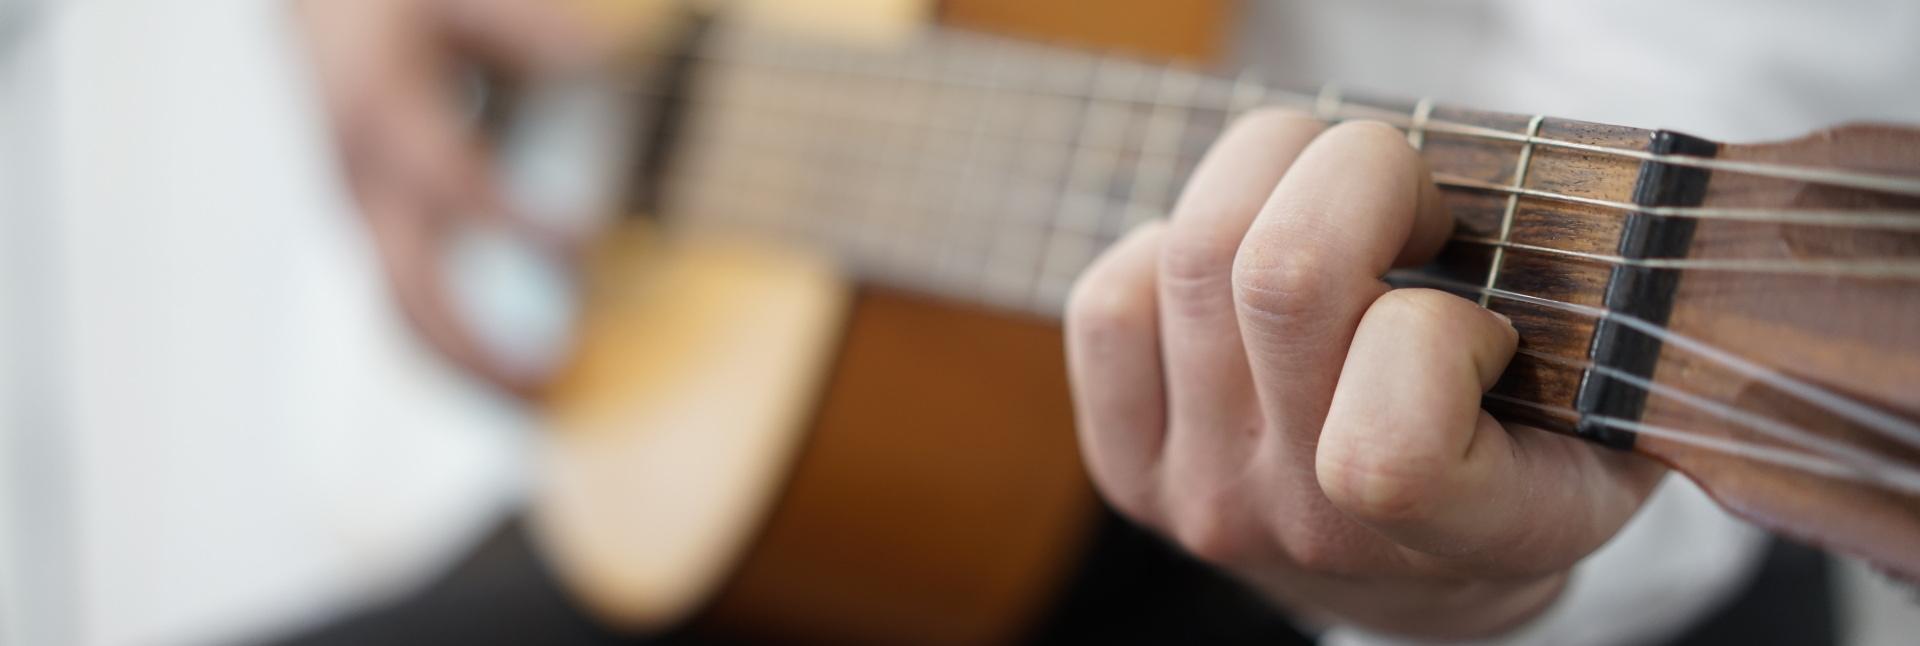 gitarrenhand